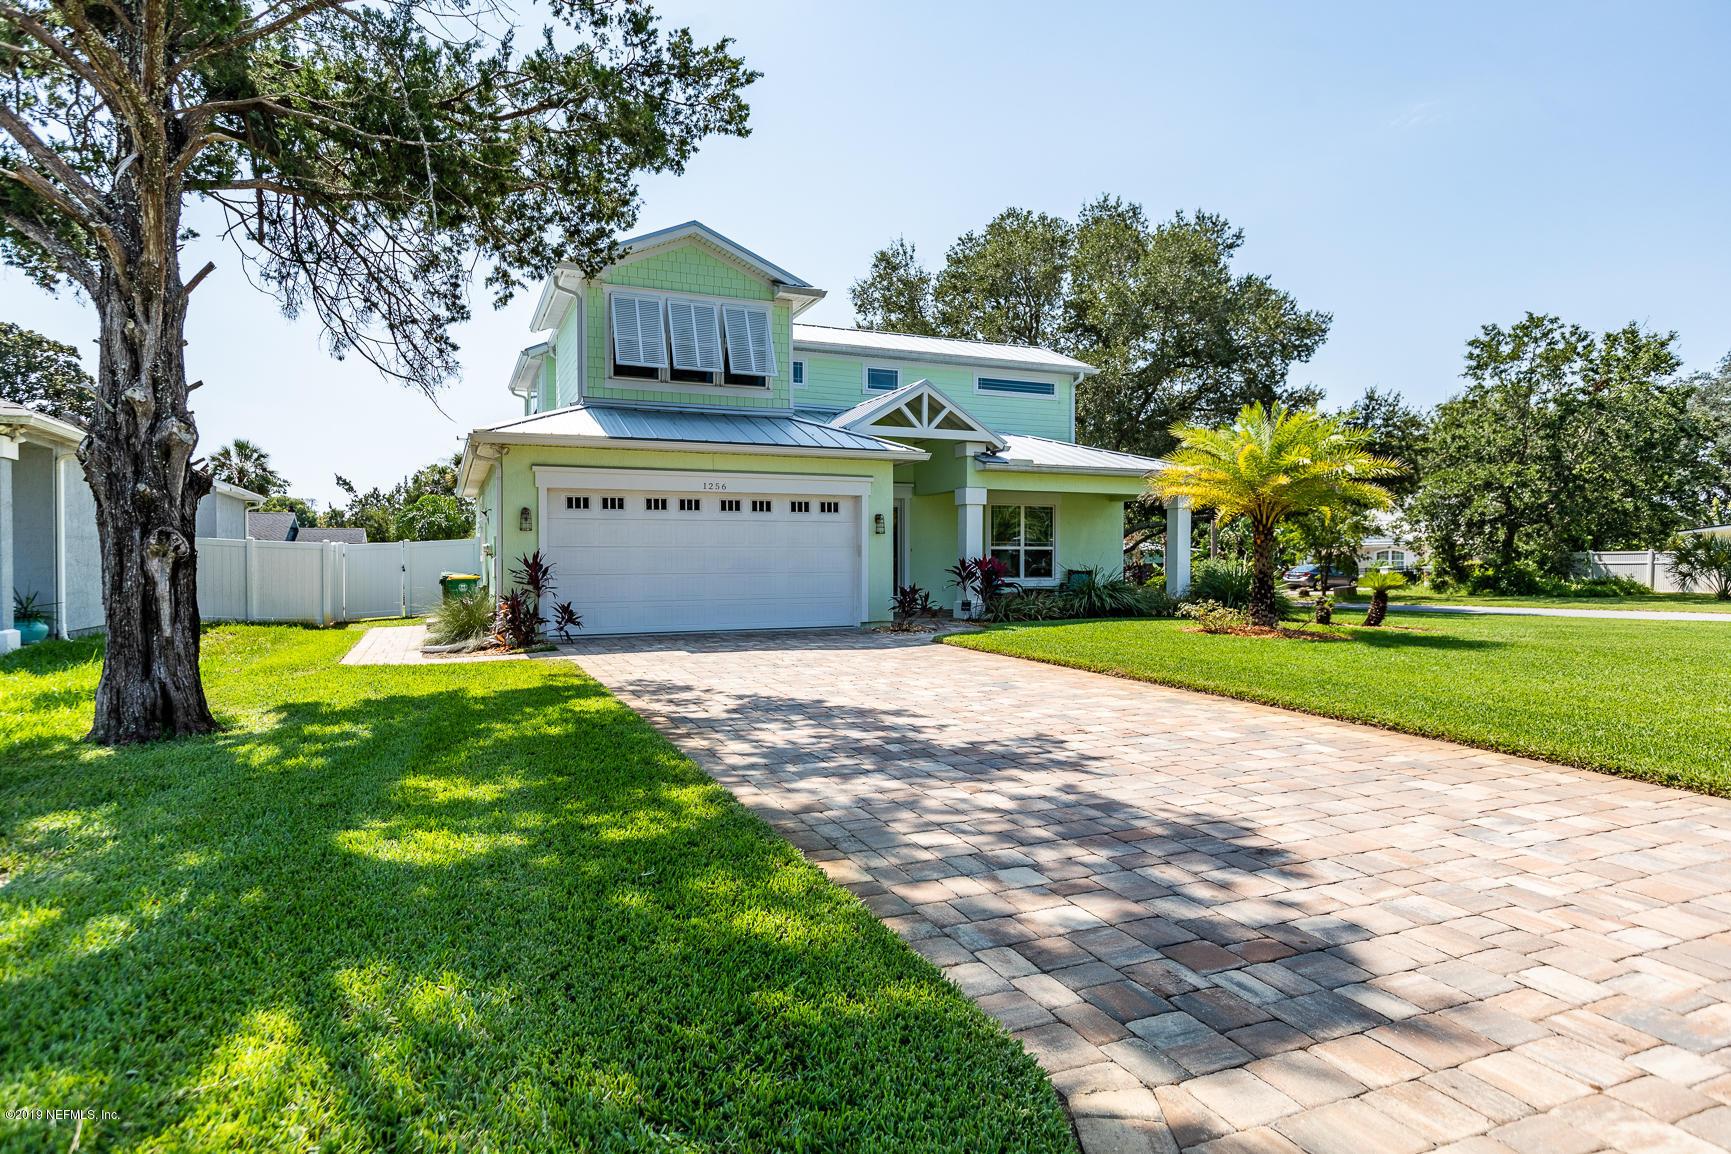 1256 PALM, JACKSONVILLE BEACH, FLORIDA 32250, 4 Bedrooms Bedrooms, ,3 BathroomsBathrooms,Rental,For Rent,PALM,1022379